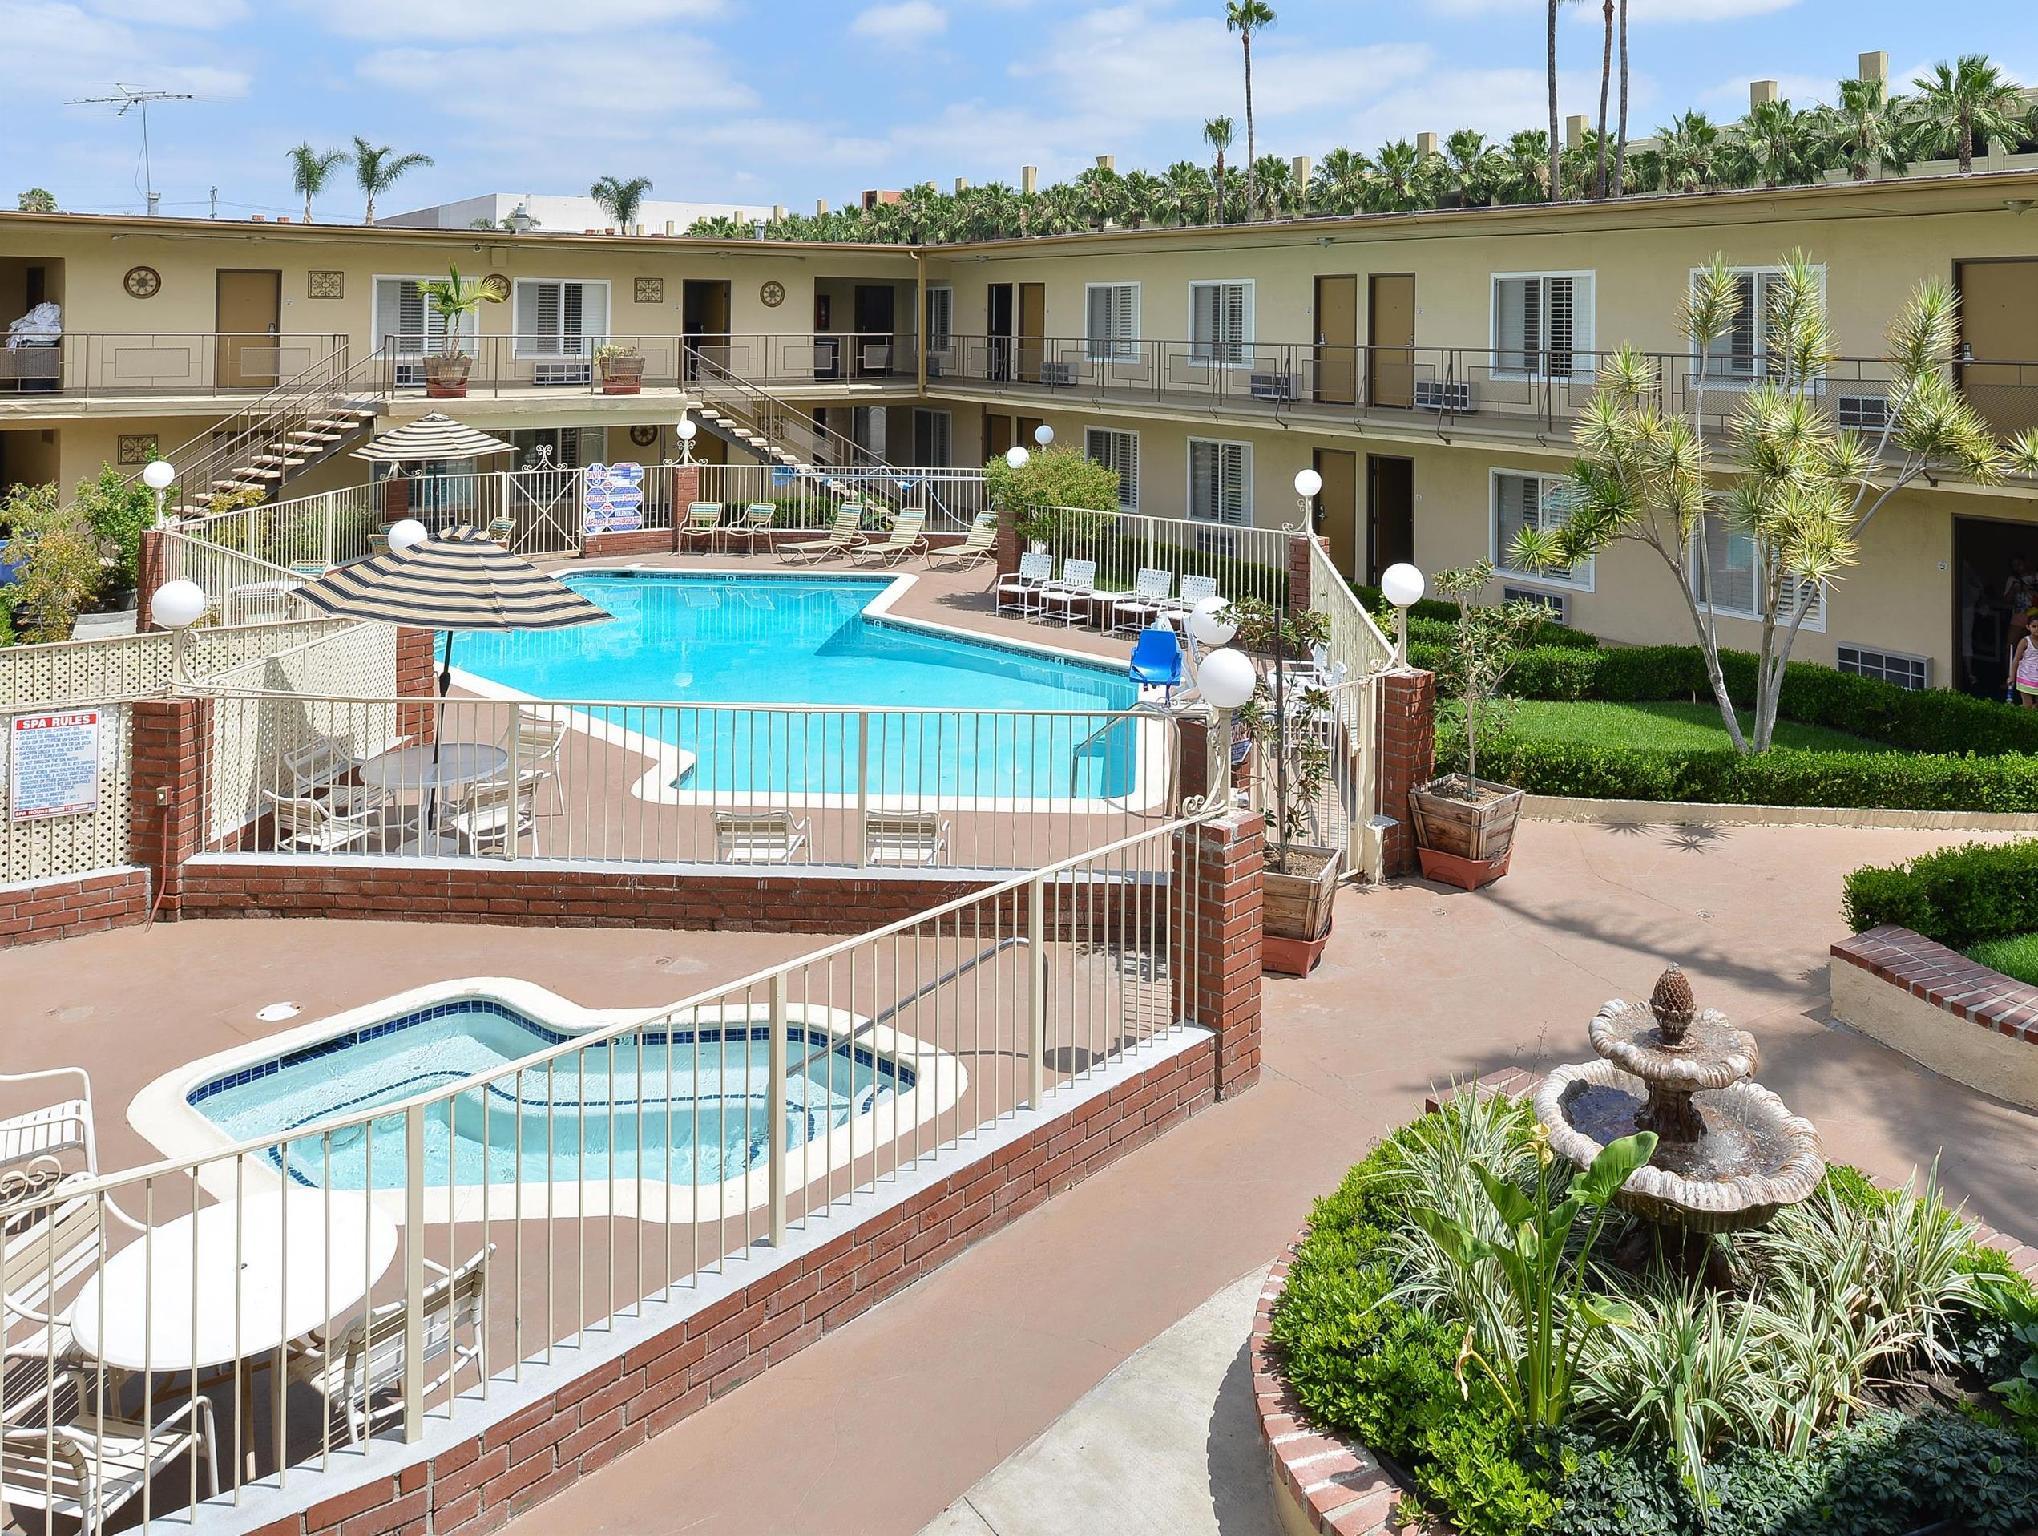 Americas Best Value Inn And Suites Anaheim Convention Center